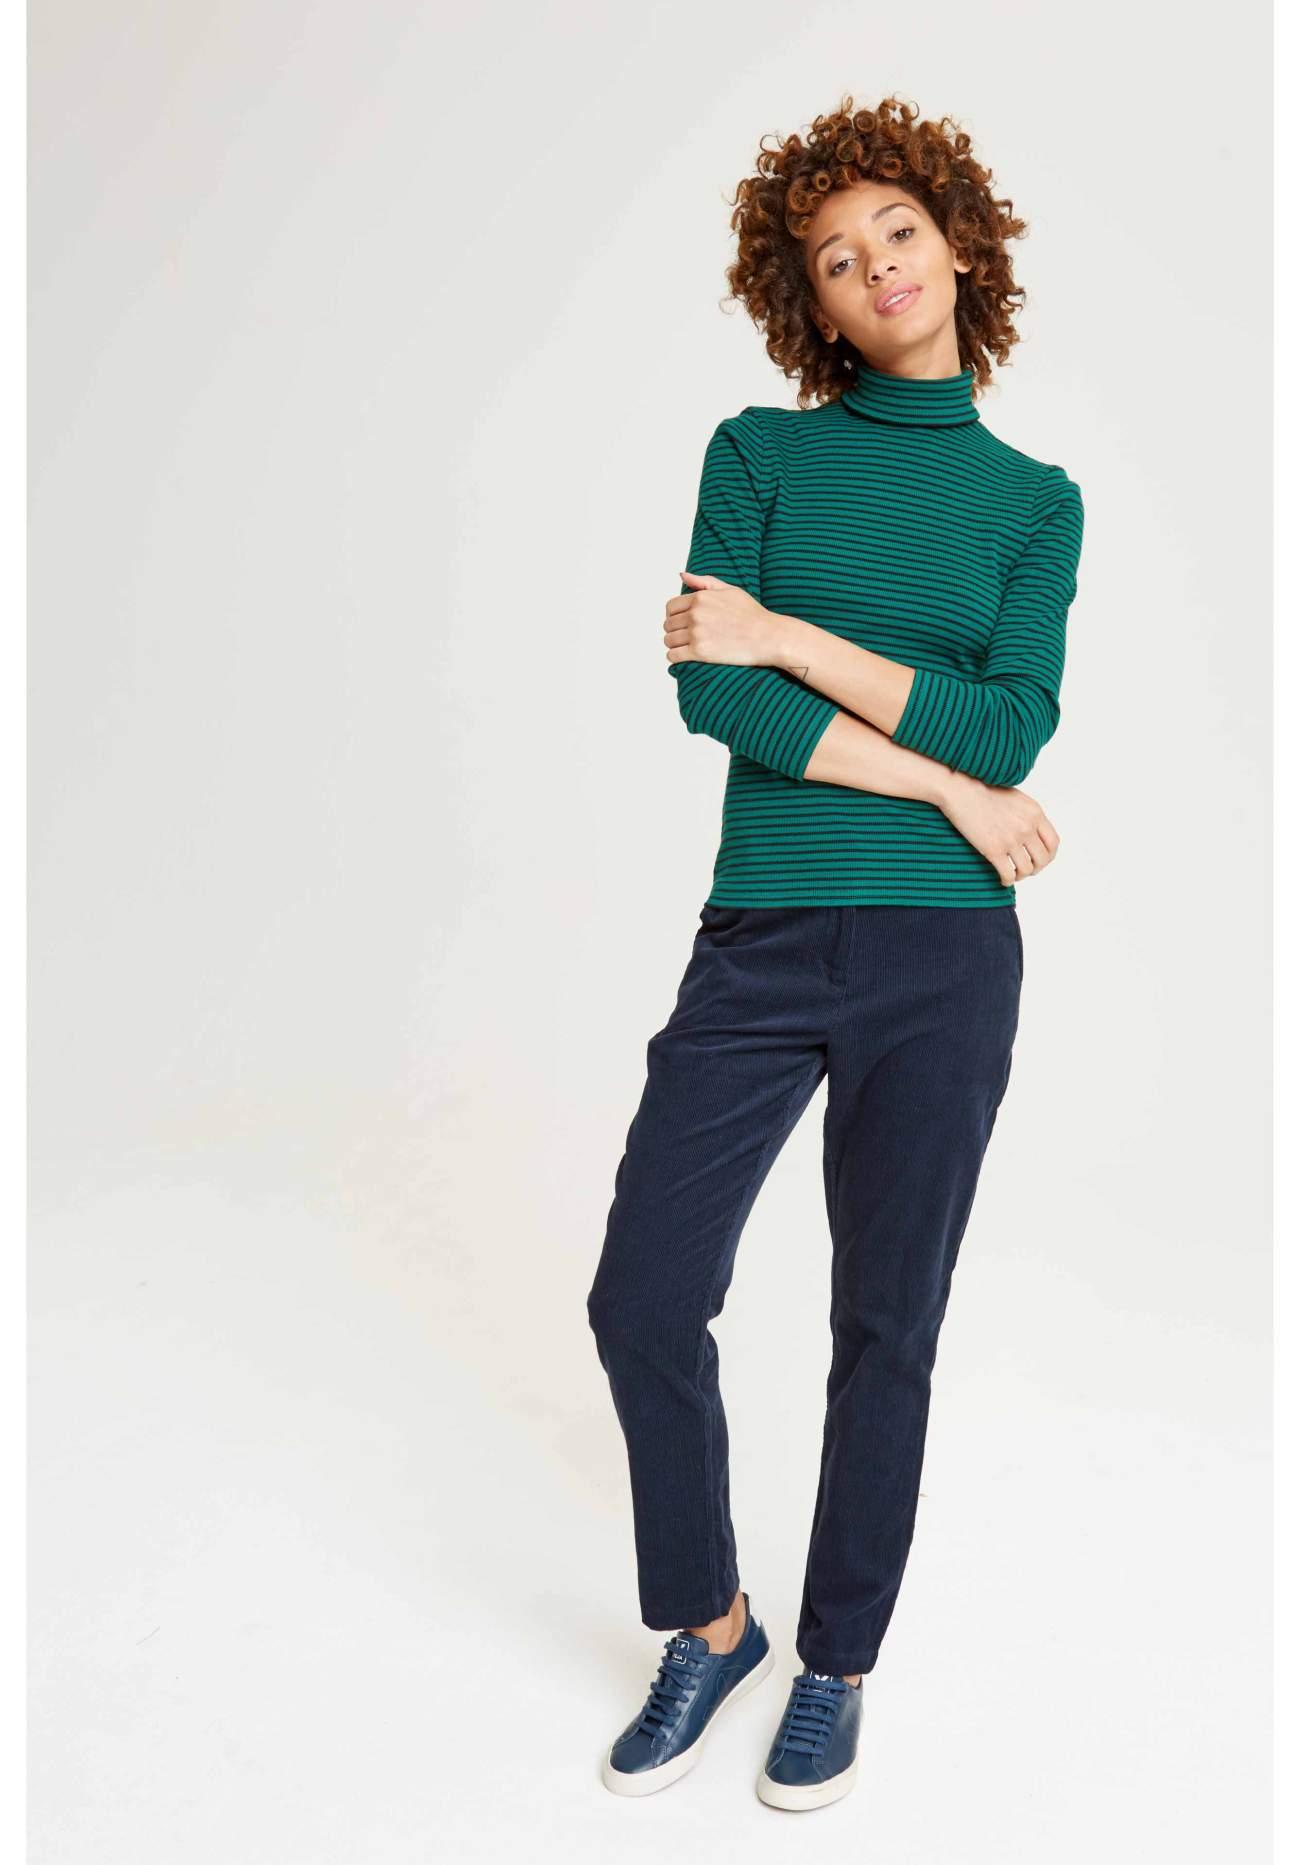 kana-corduroy-trousers-navy-660c00a06f21